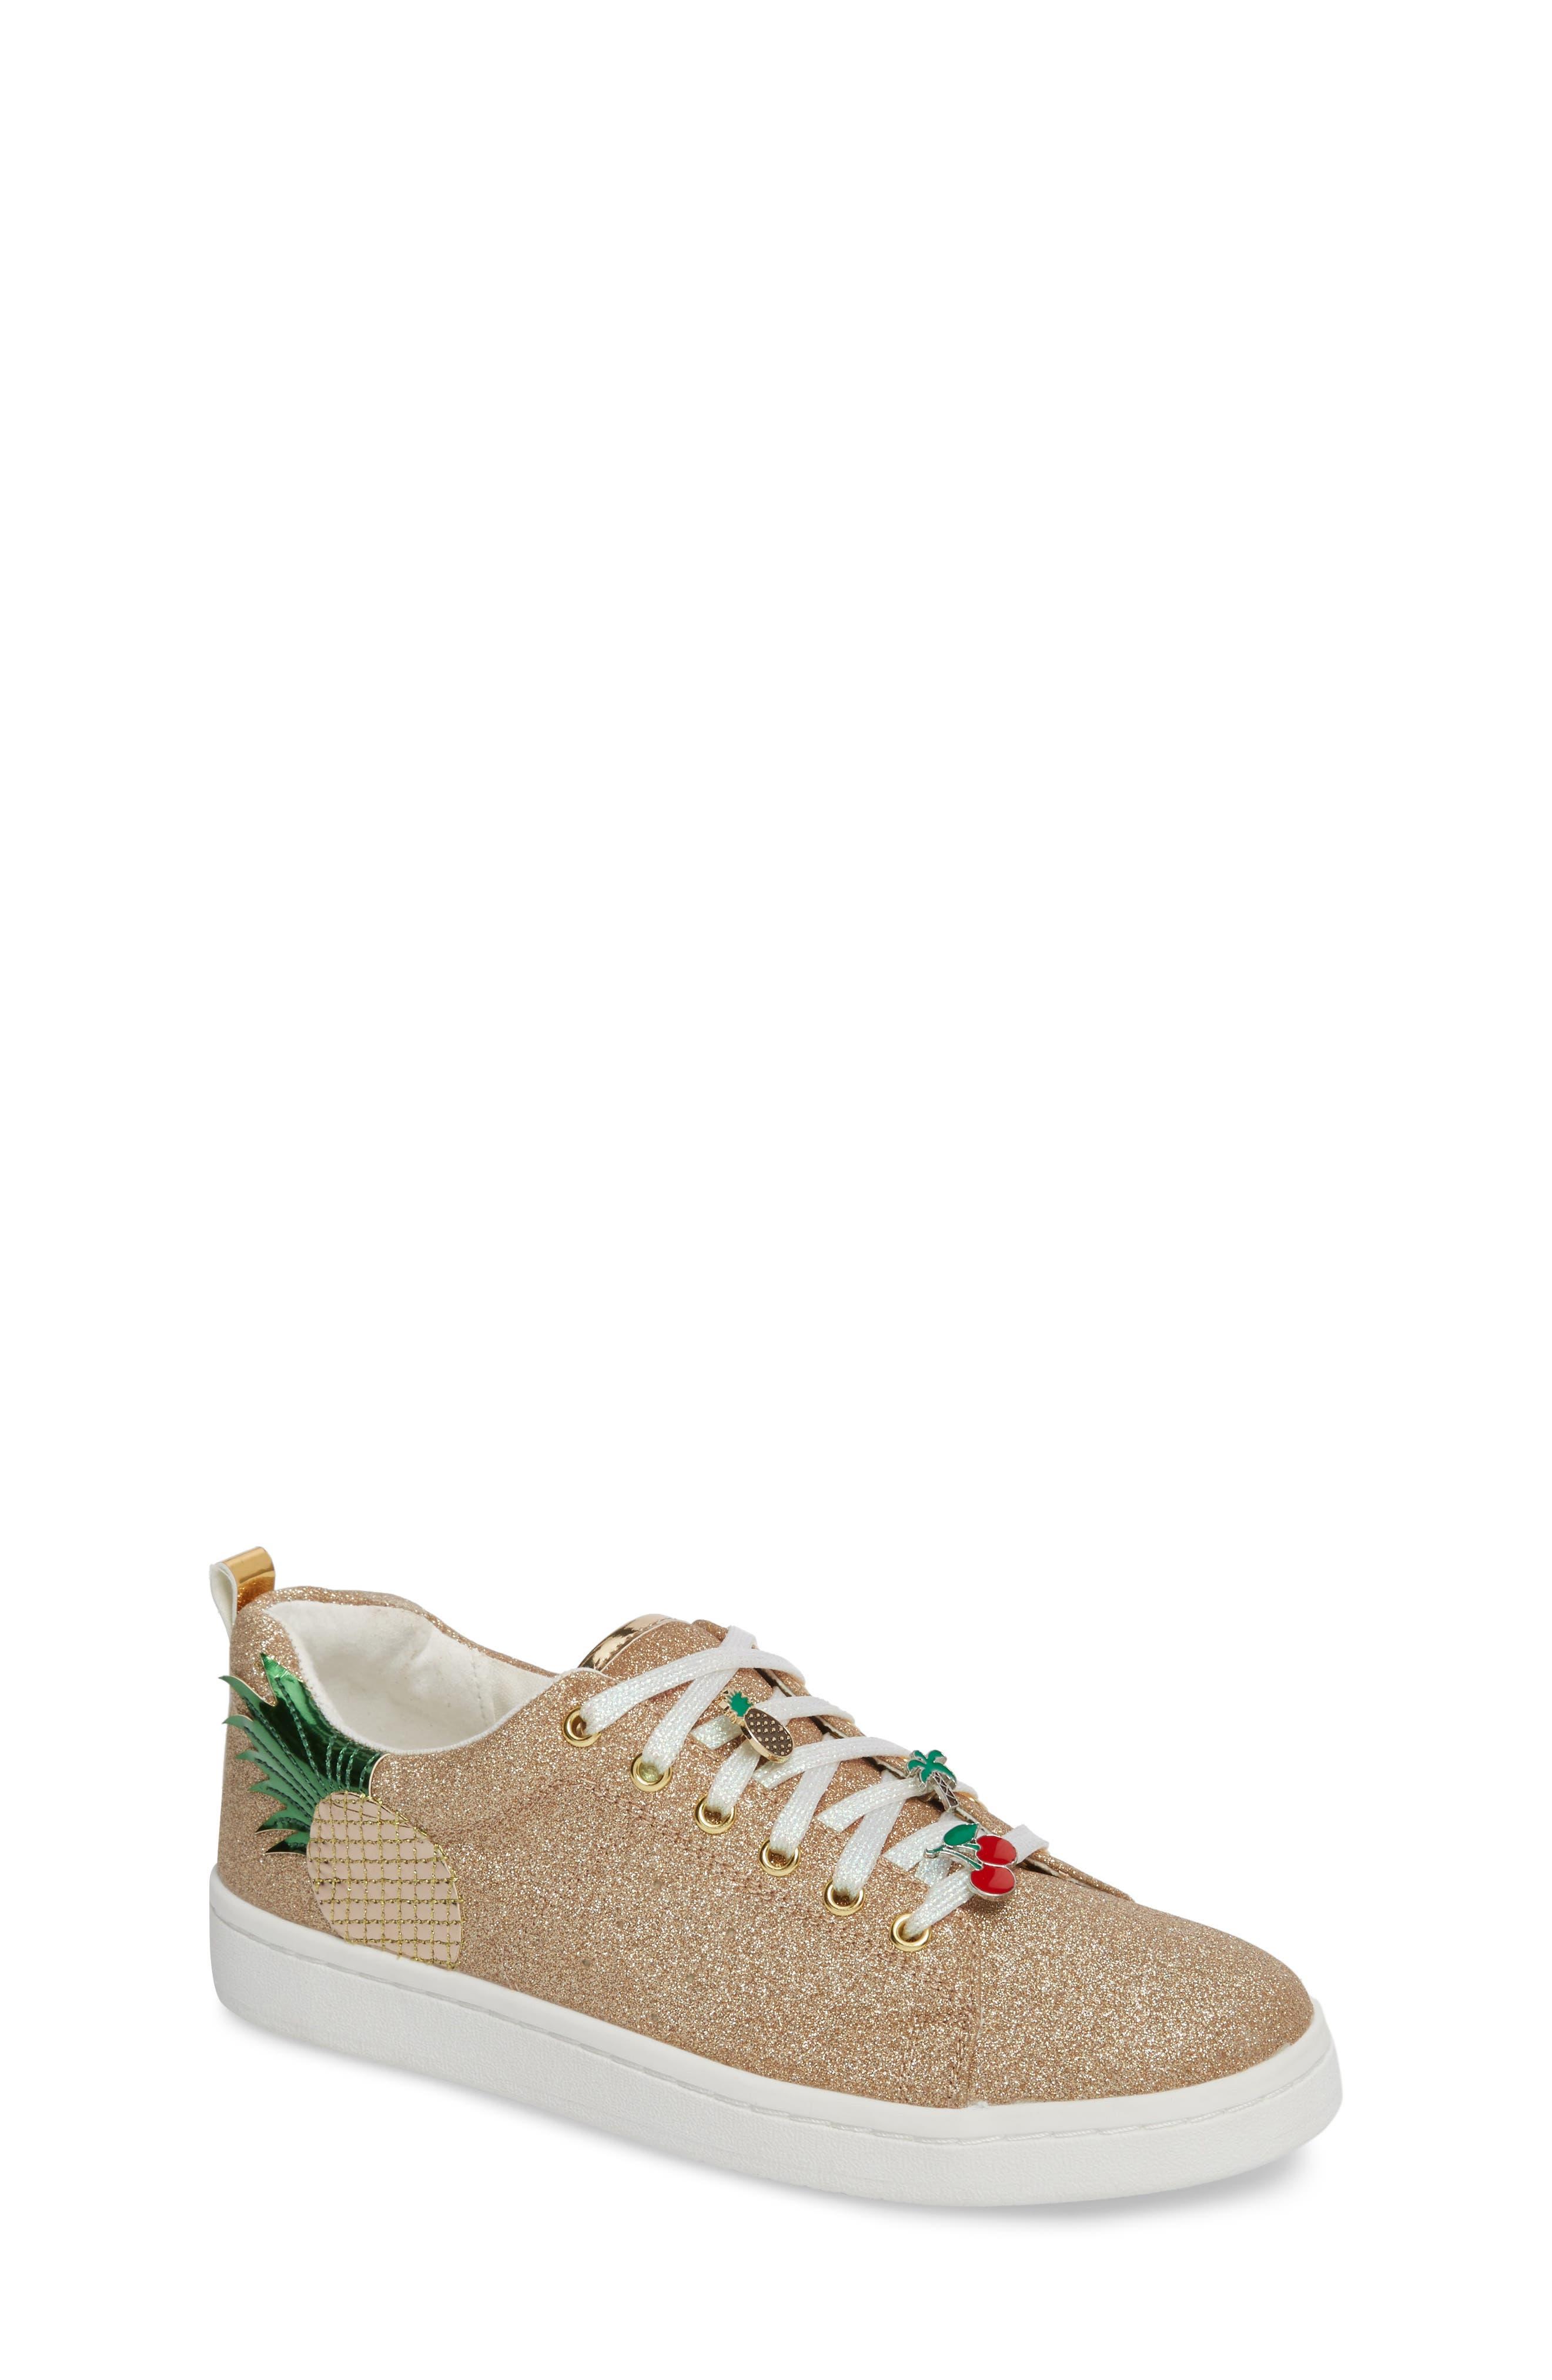 Blane Myth Glitter Sneaker,                         Main,                         color, Golden Pineapple Faux Leather